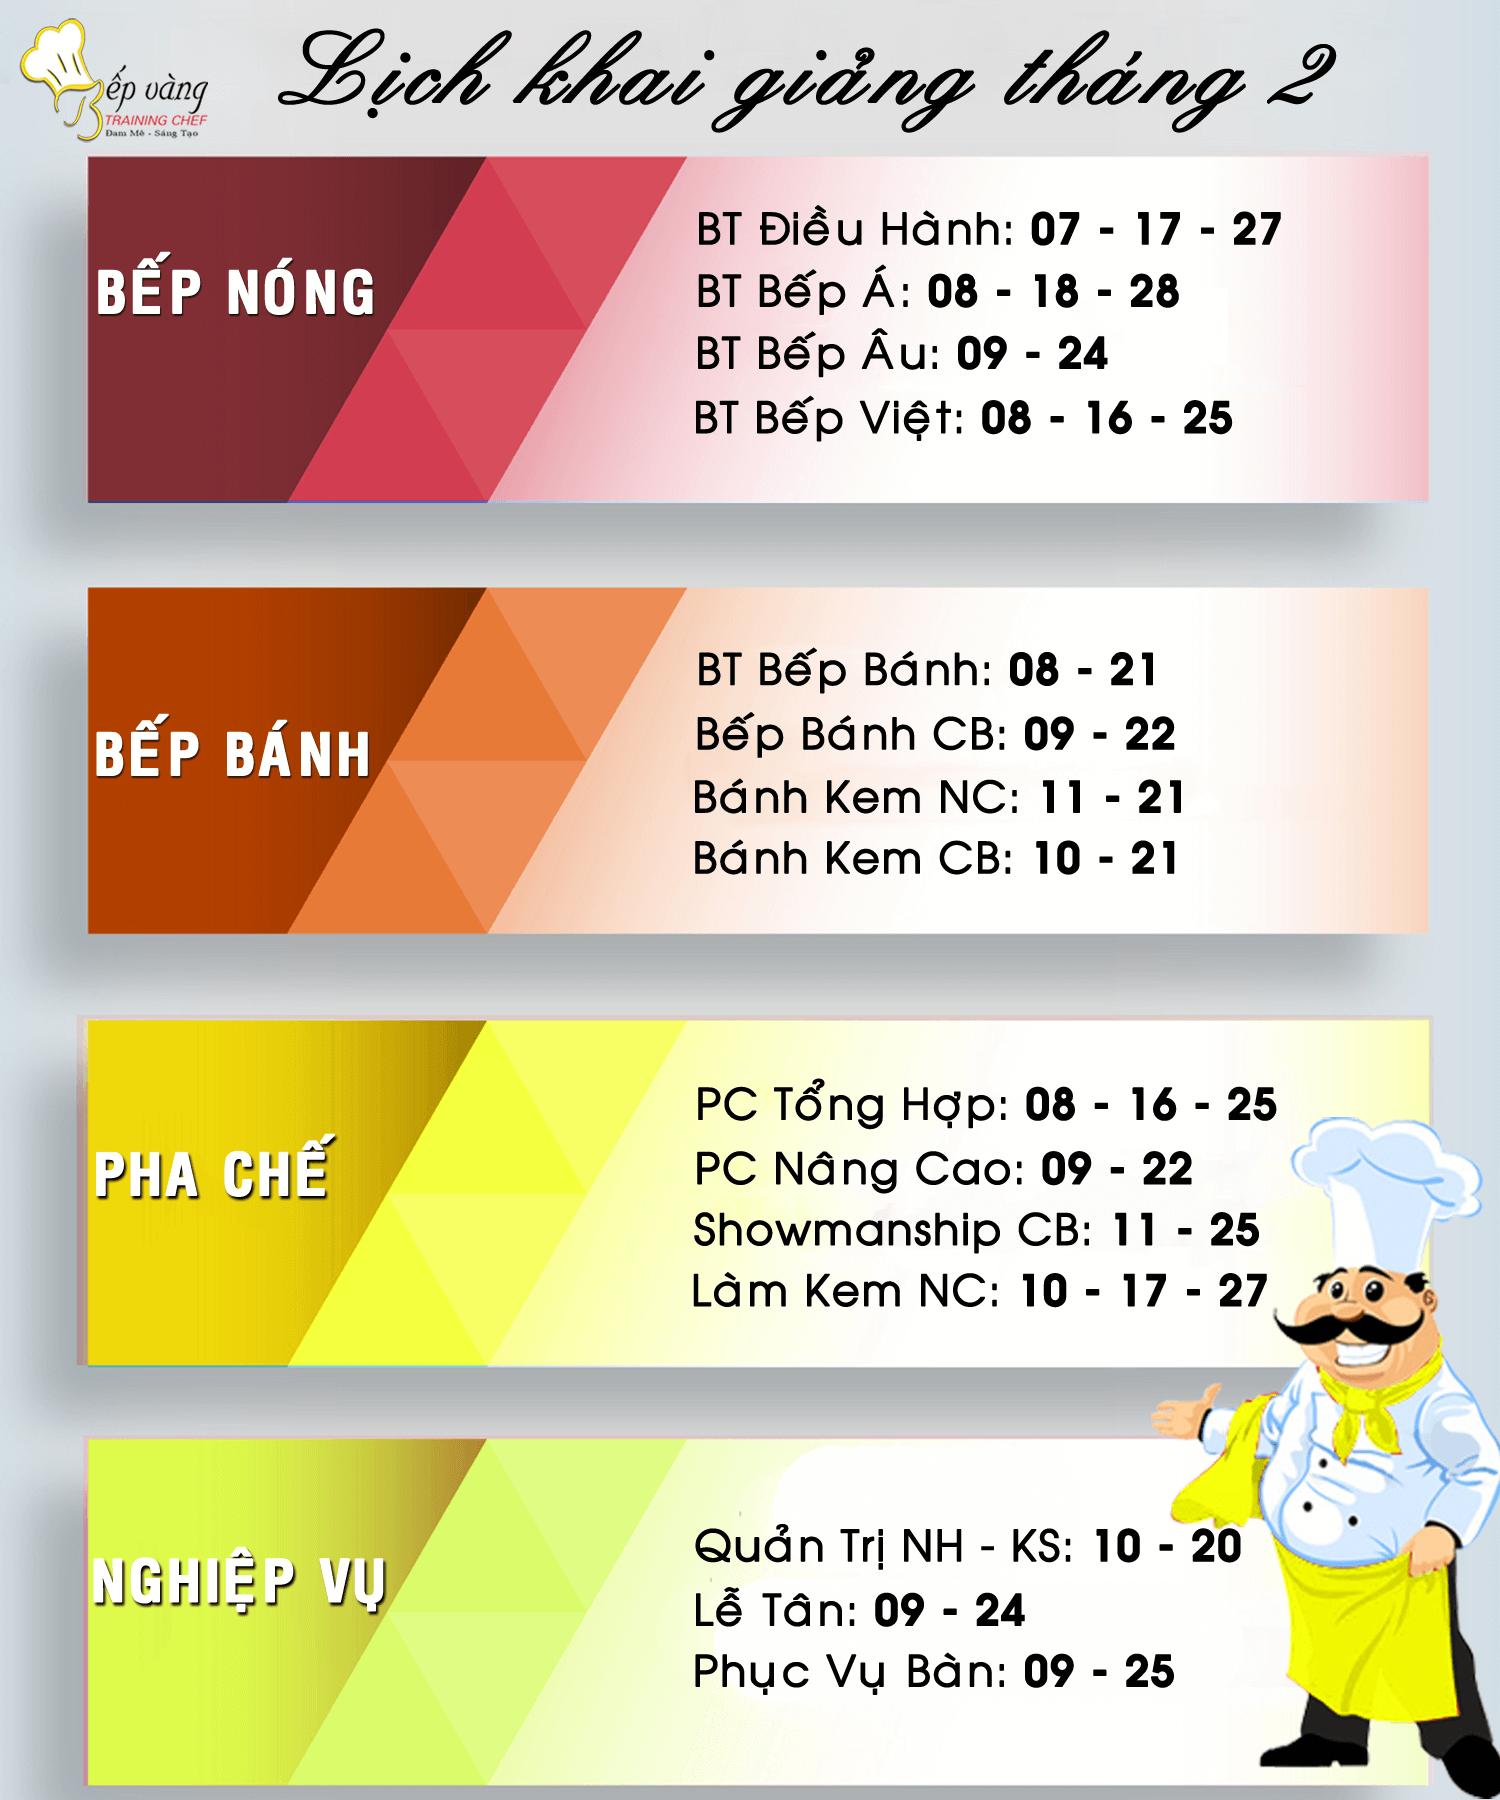 lich-khai-giang-2-2017